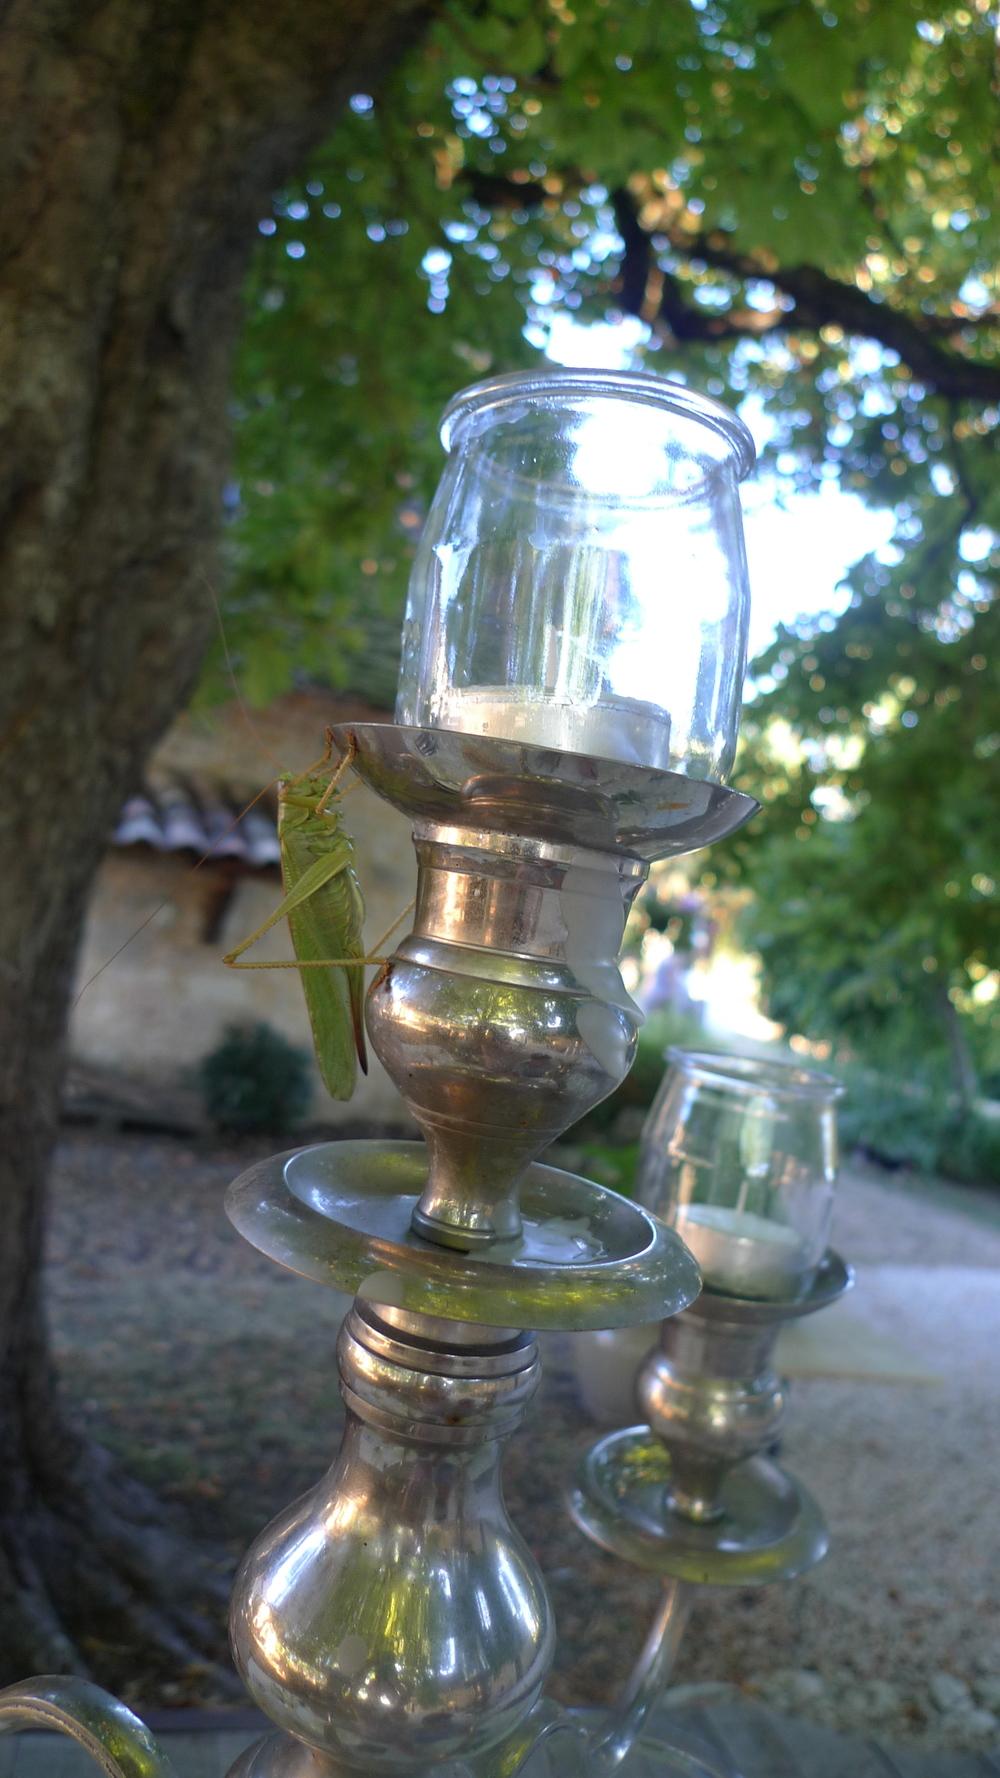 chartreuse le cariol - dordogne, france